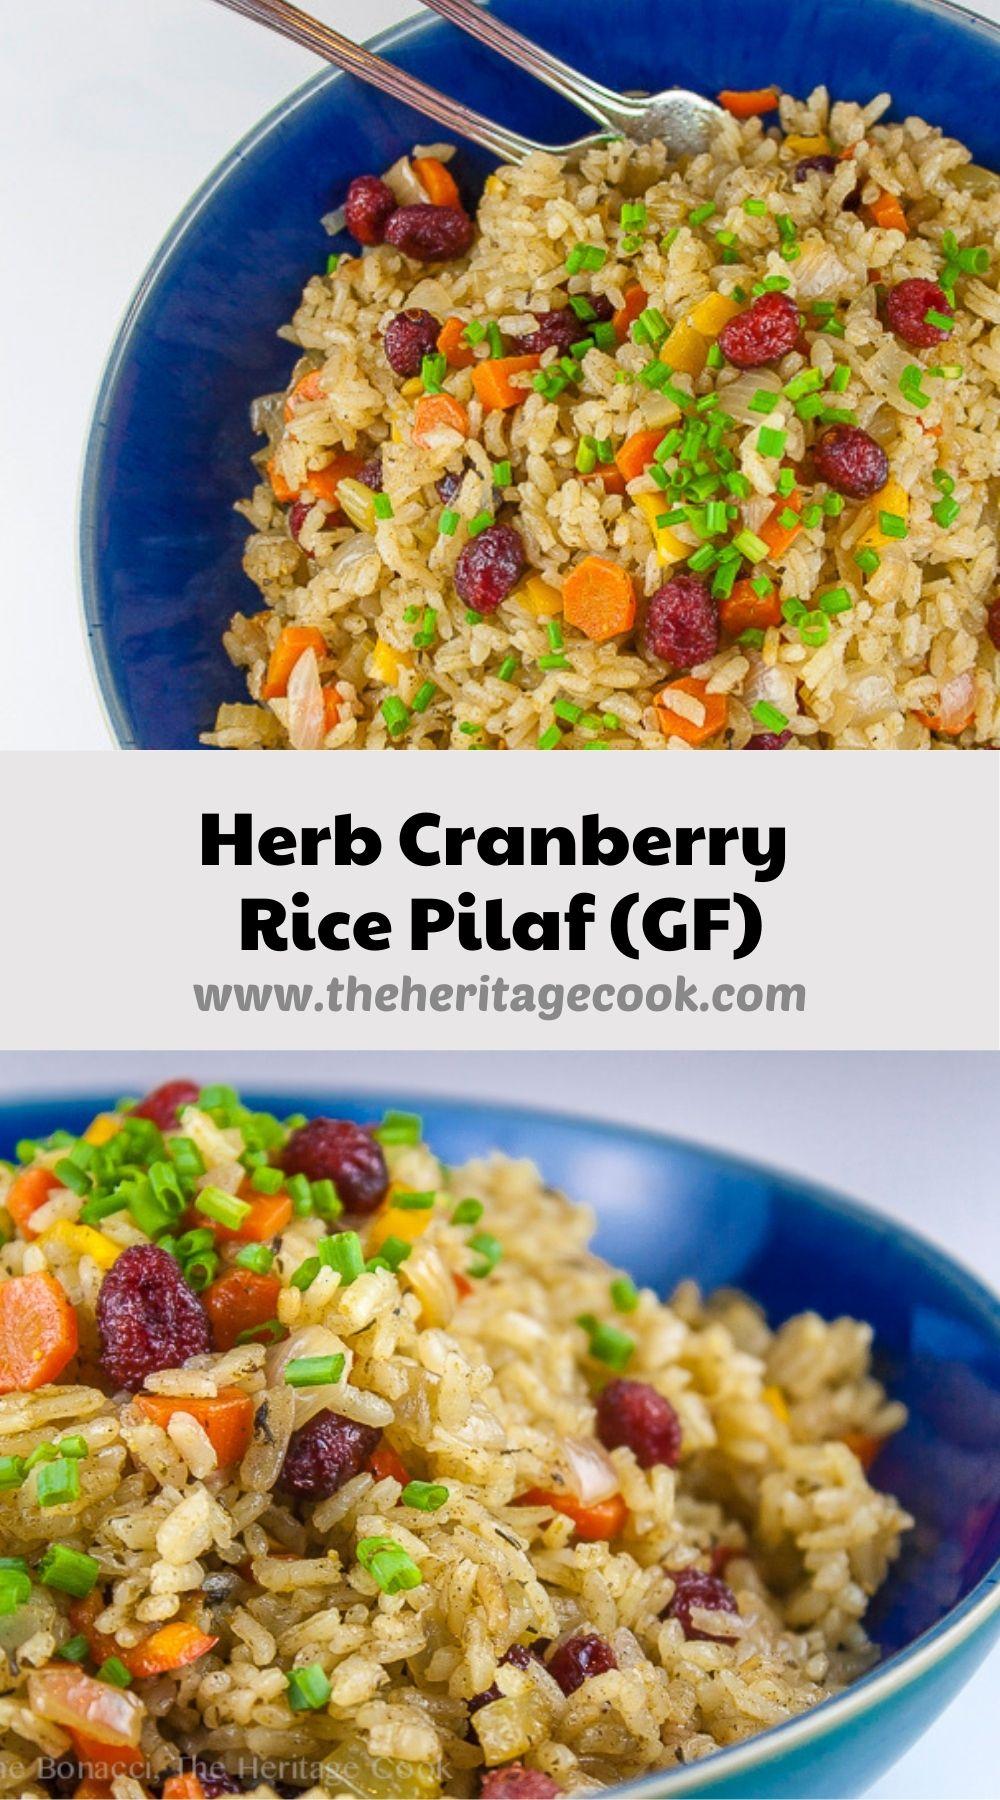 Herb Cranberry Rice Pilaf; © 2021 Jane Bonacci, The Heritage Cook